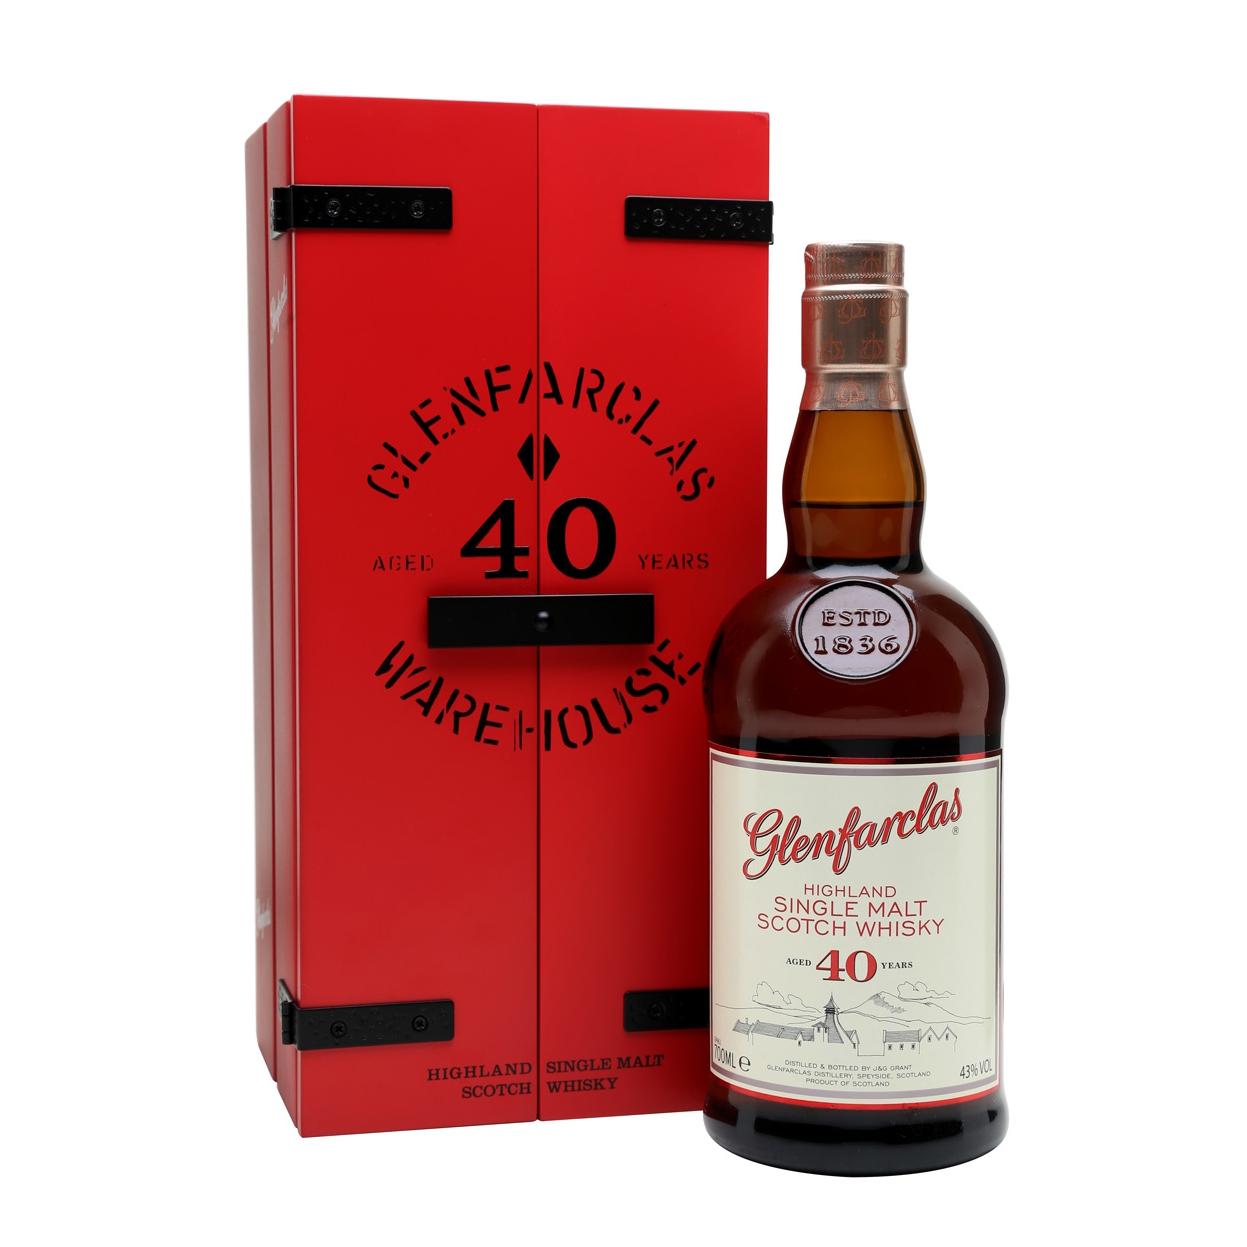 Glenfarclas cask strength single malt whisky scotch sherry speyside 40 years warehouse edition 2017 40年 威士忌